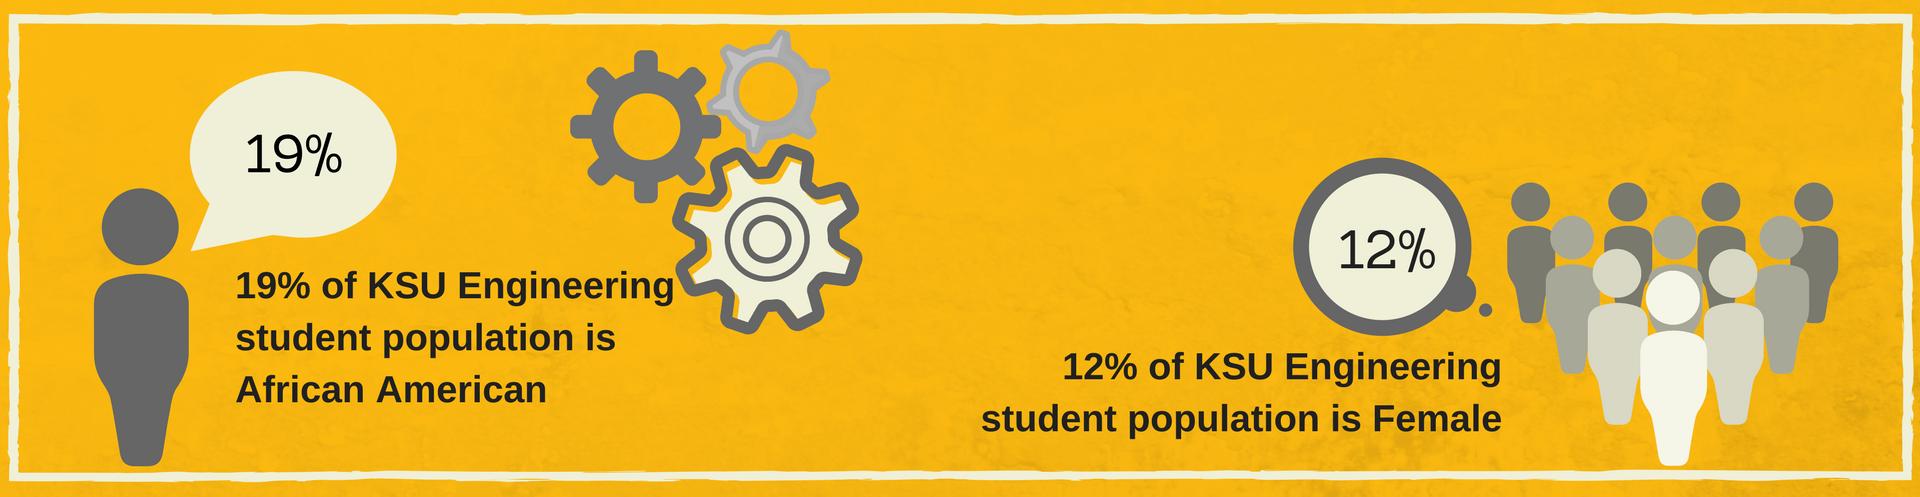 KSU Engineering students by the numbers